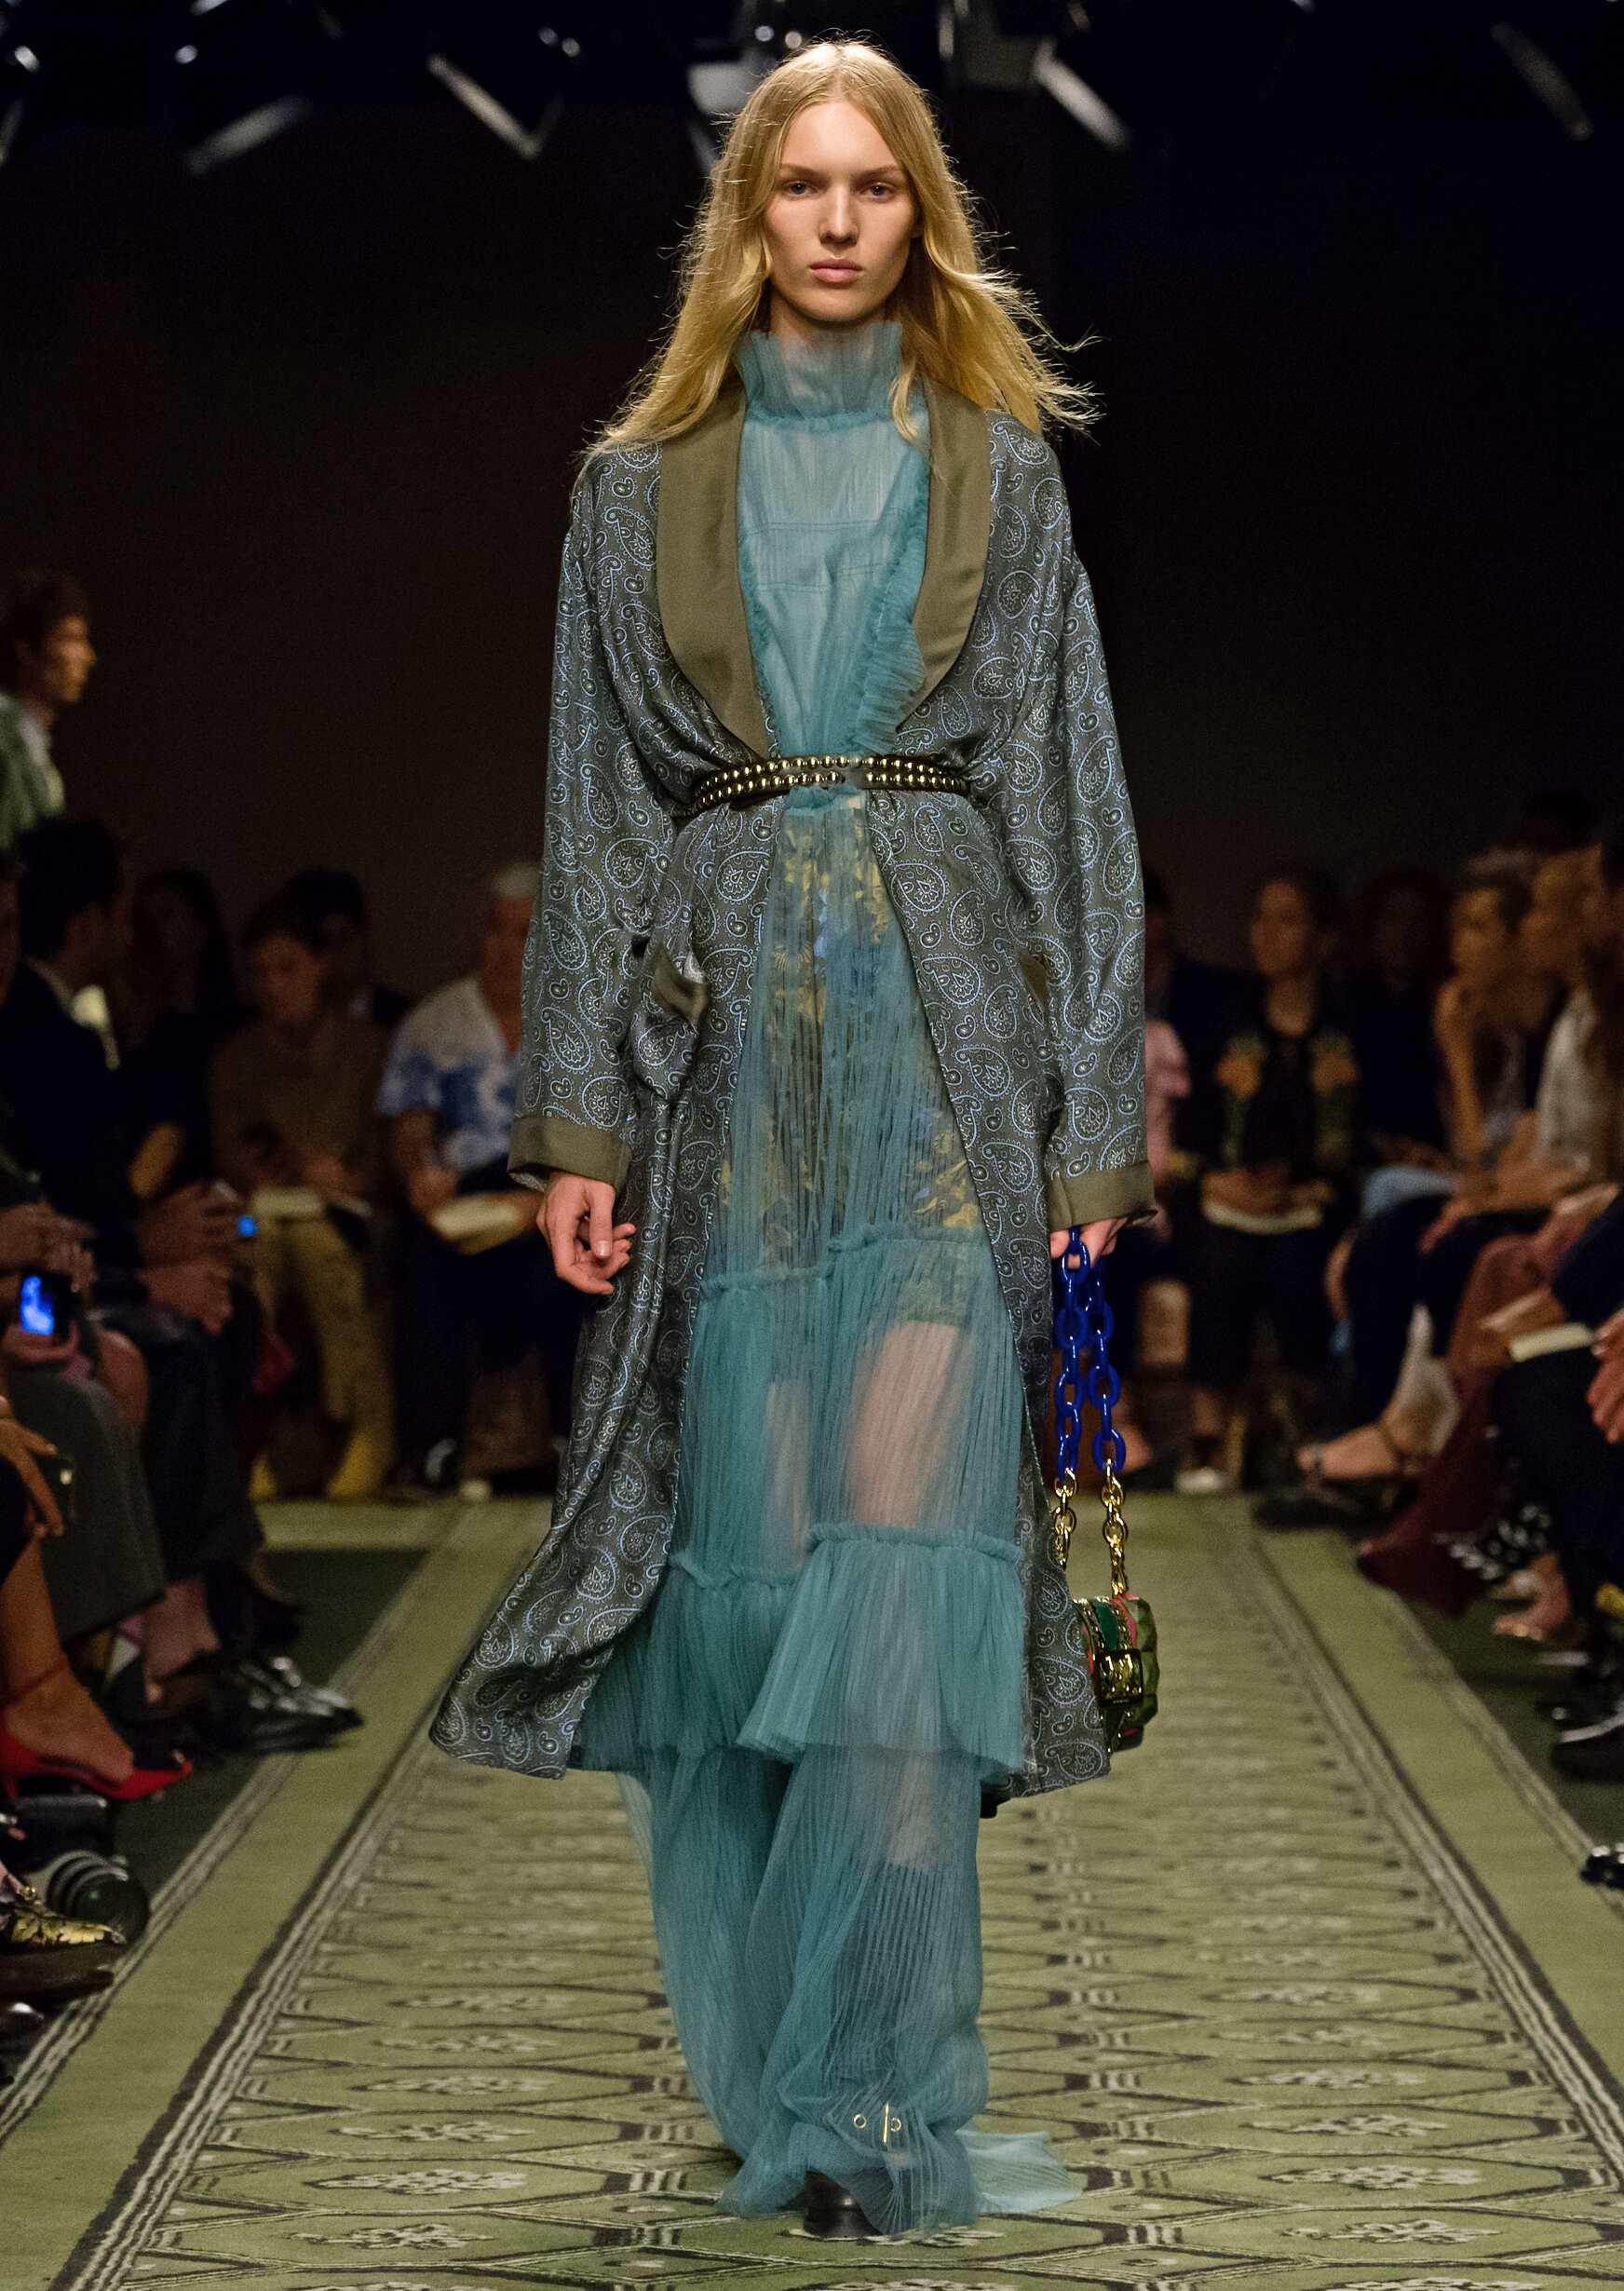 2016 Catwalk Burberry Woman Fashion Show London